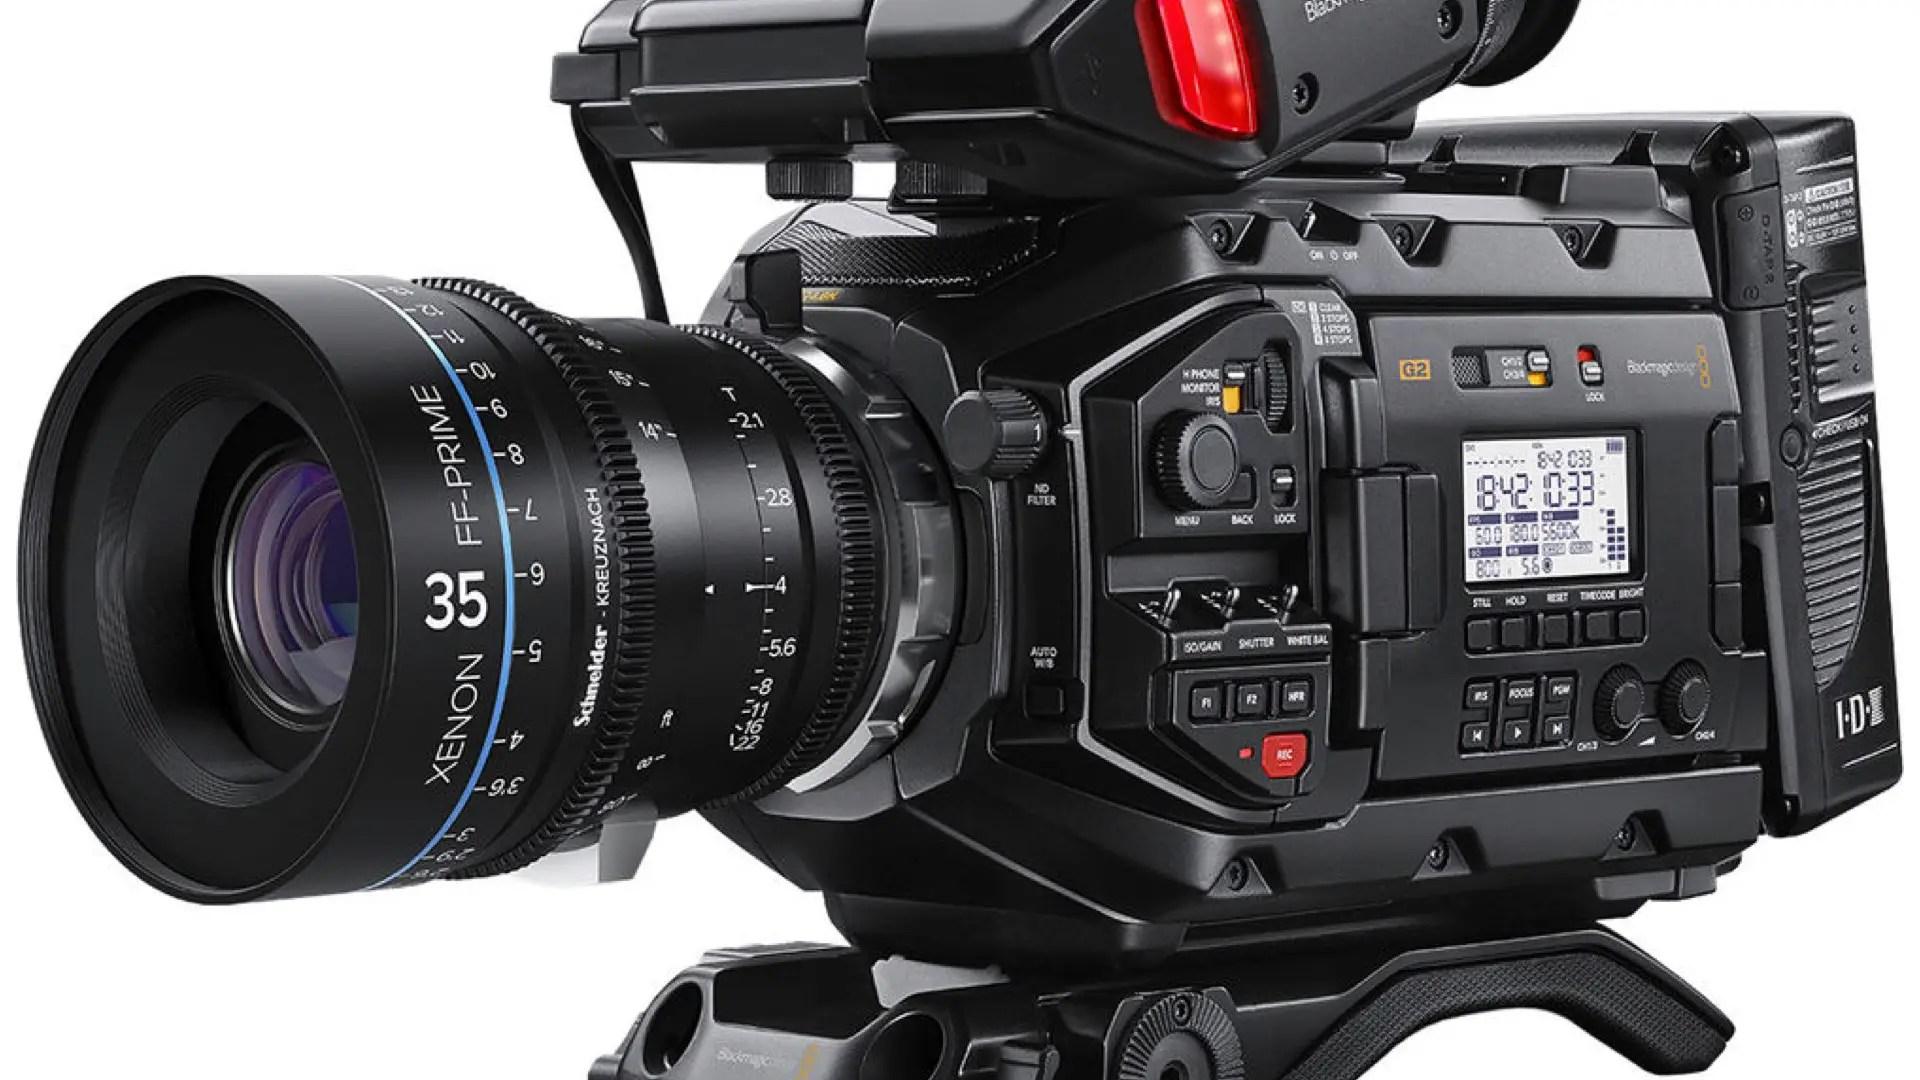 Ursa Mini Pro 4 6k G2 Slow Motion Footage Y M Cinema News Insights On Digital Cinema